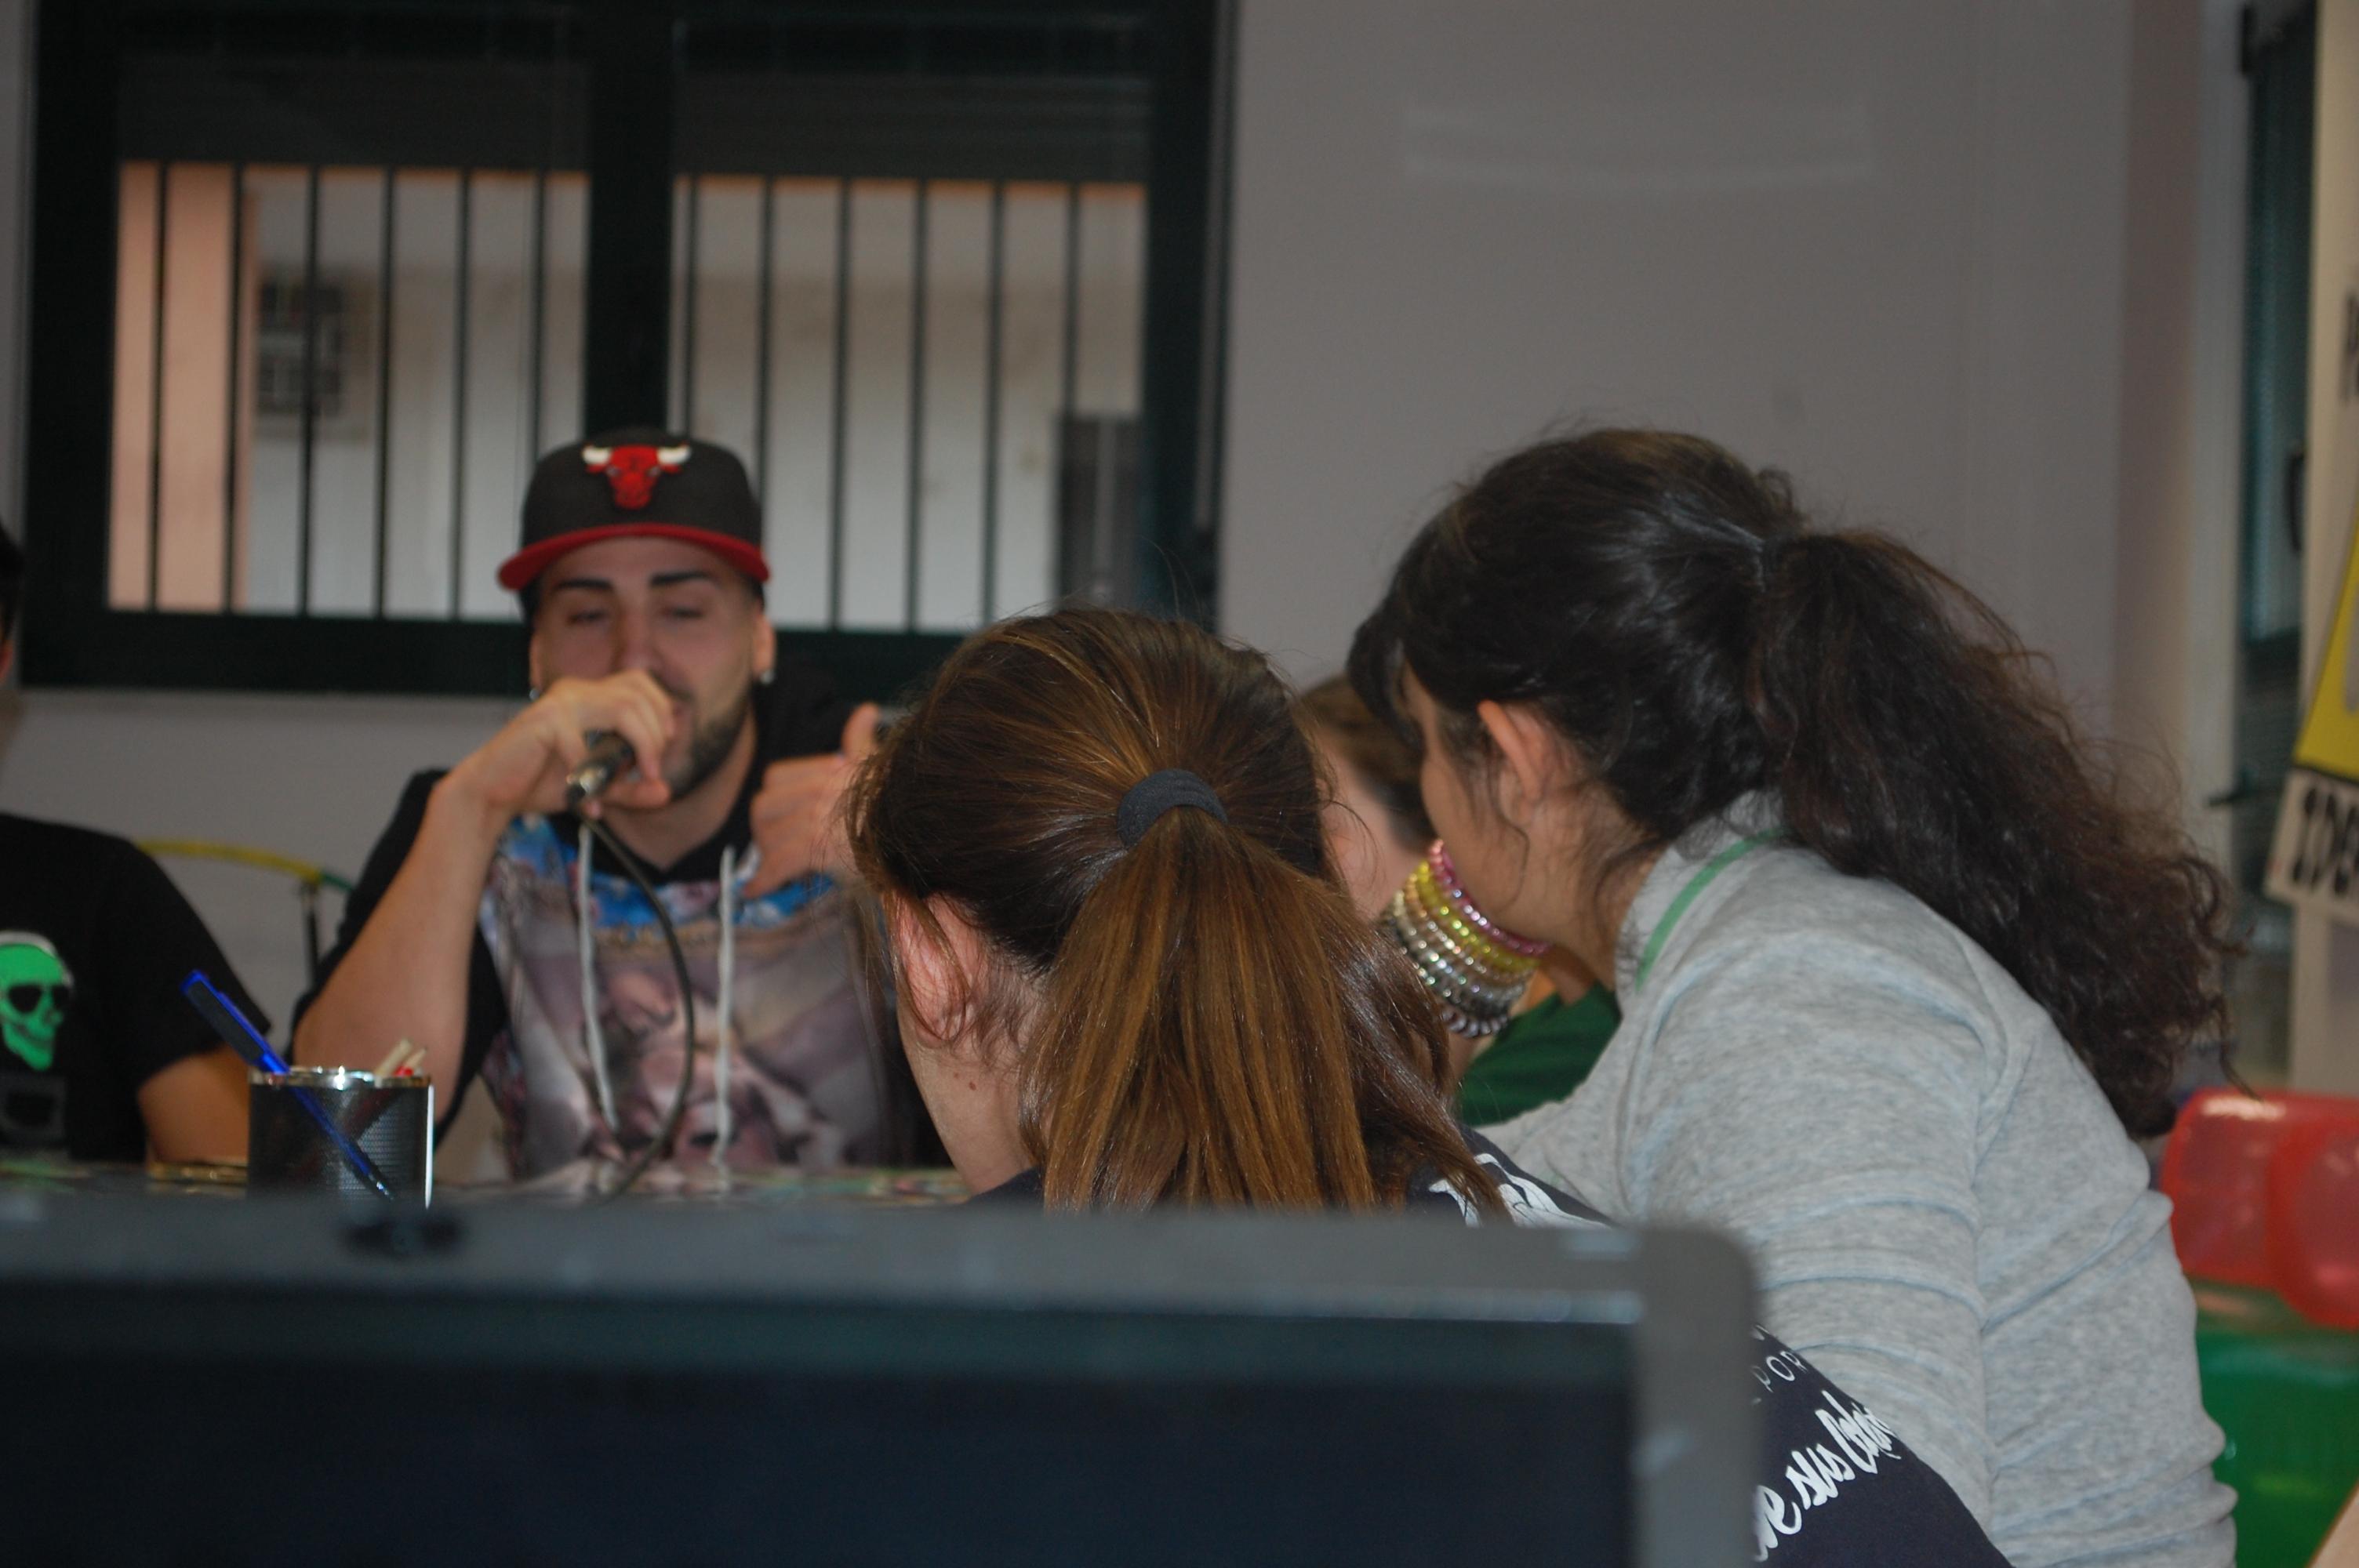 En CiberVoz entrevistamos a  Boticheli rapero salamantino